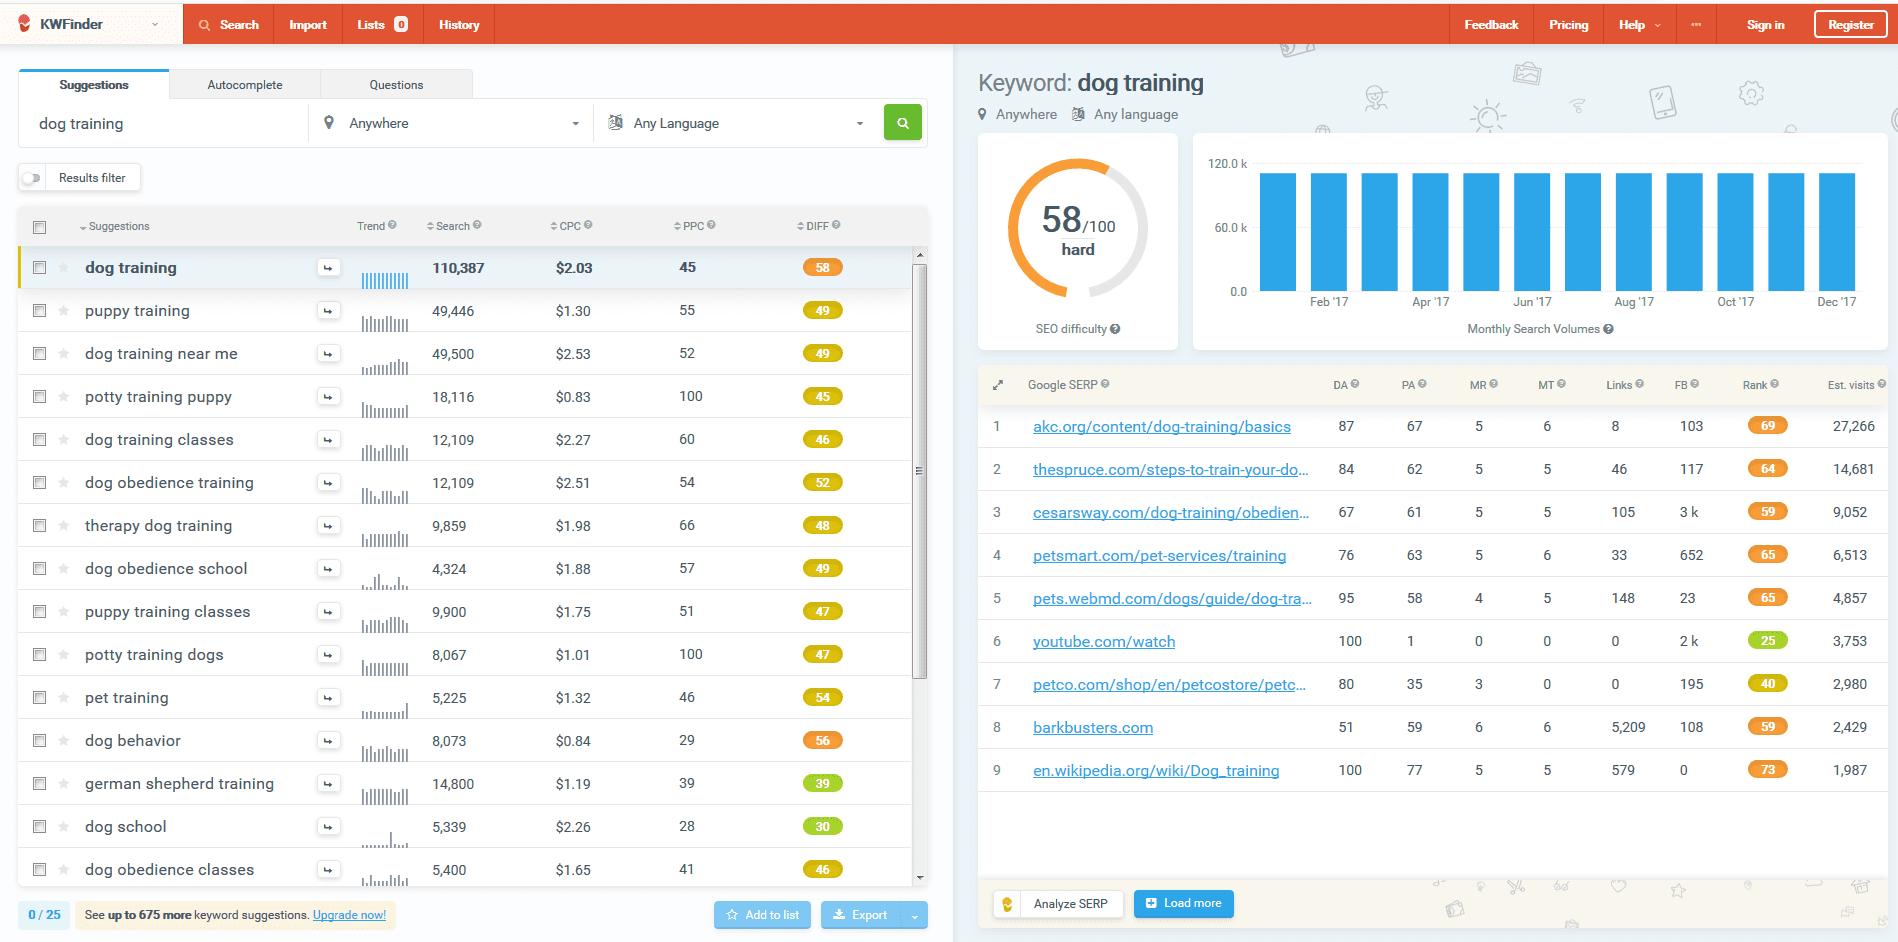 kwfinder for keywords research